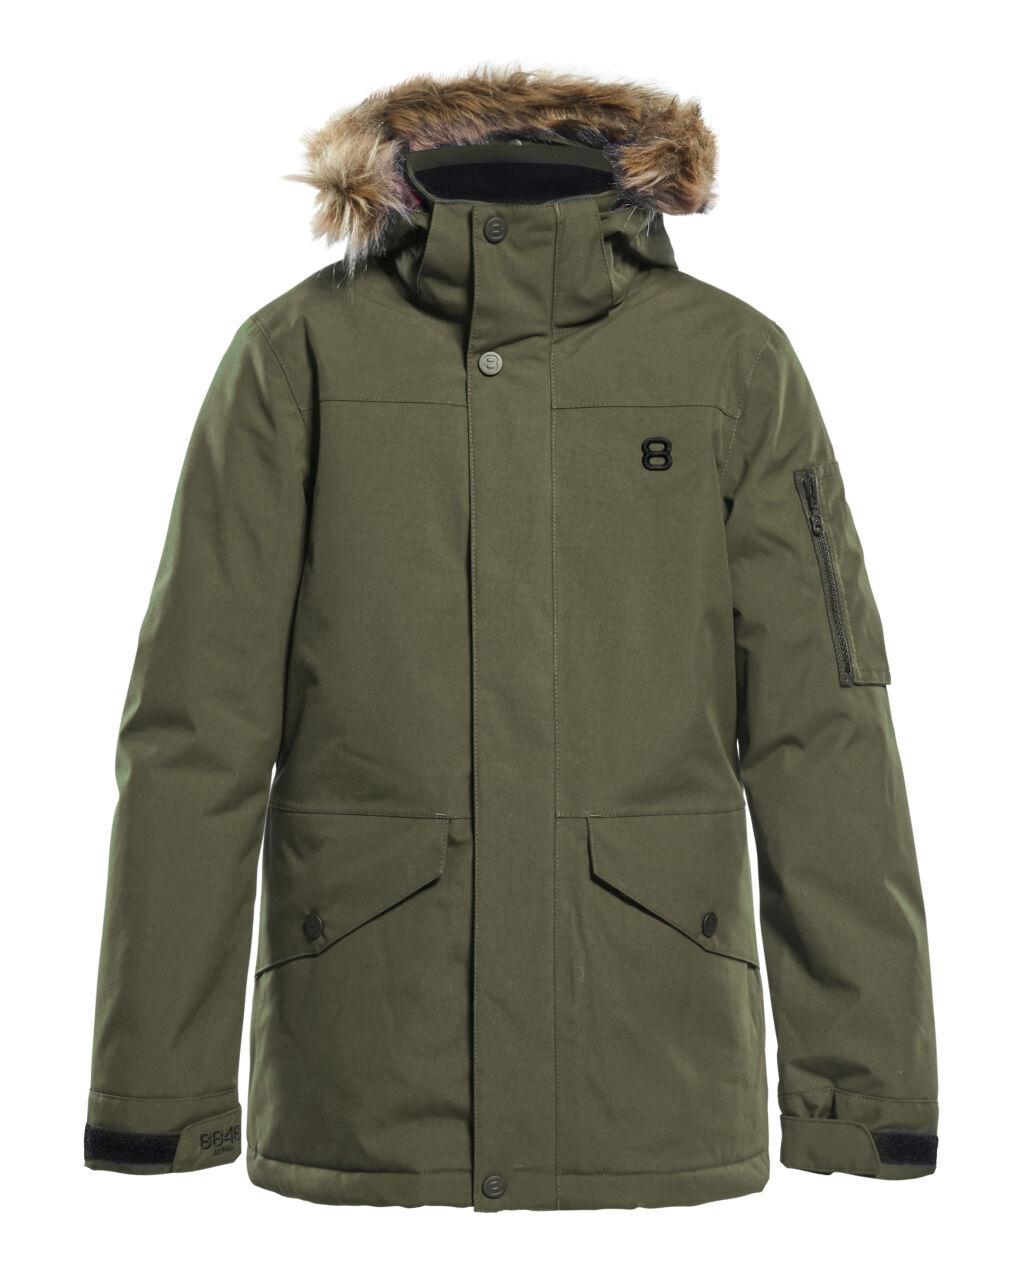 8848 Altitude Eward jacket jrParkatakki